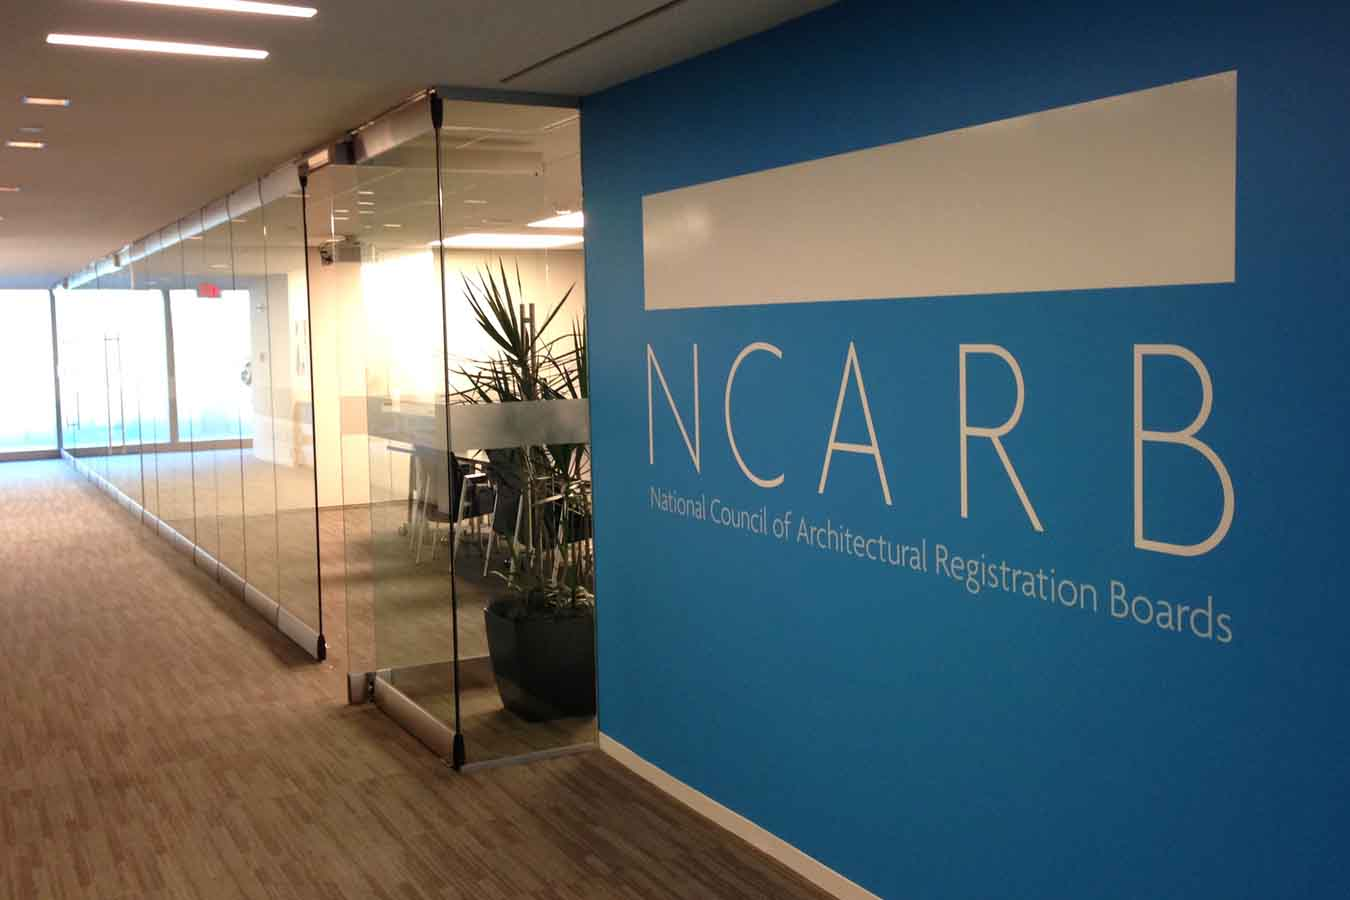 ncarb-office.jpg